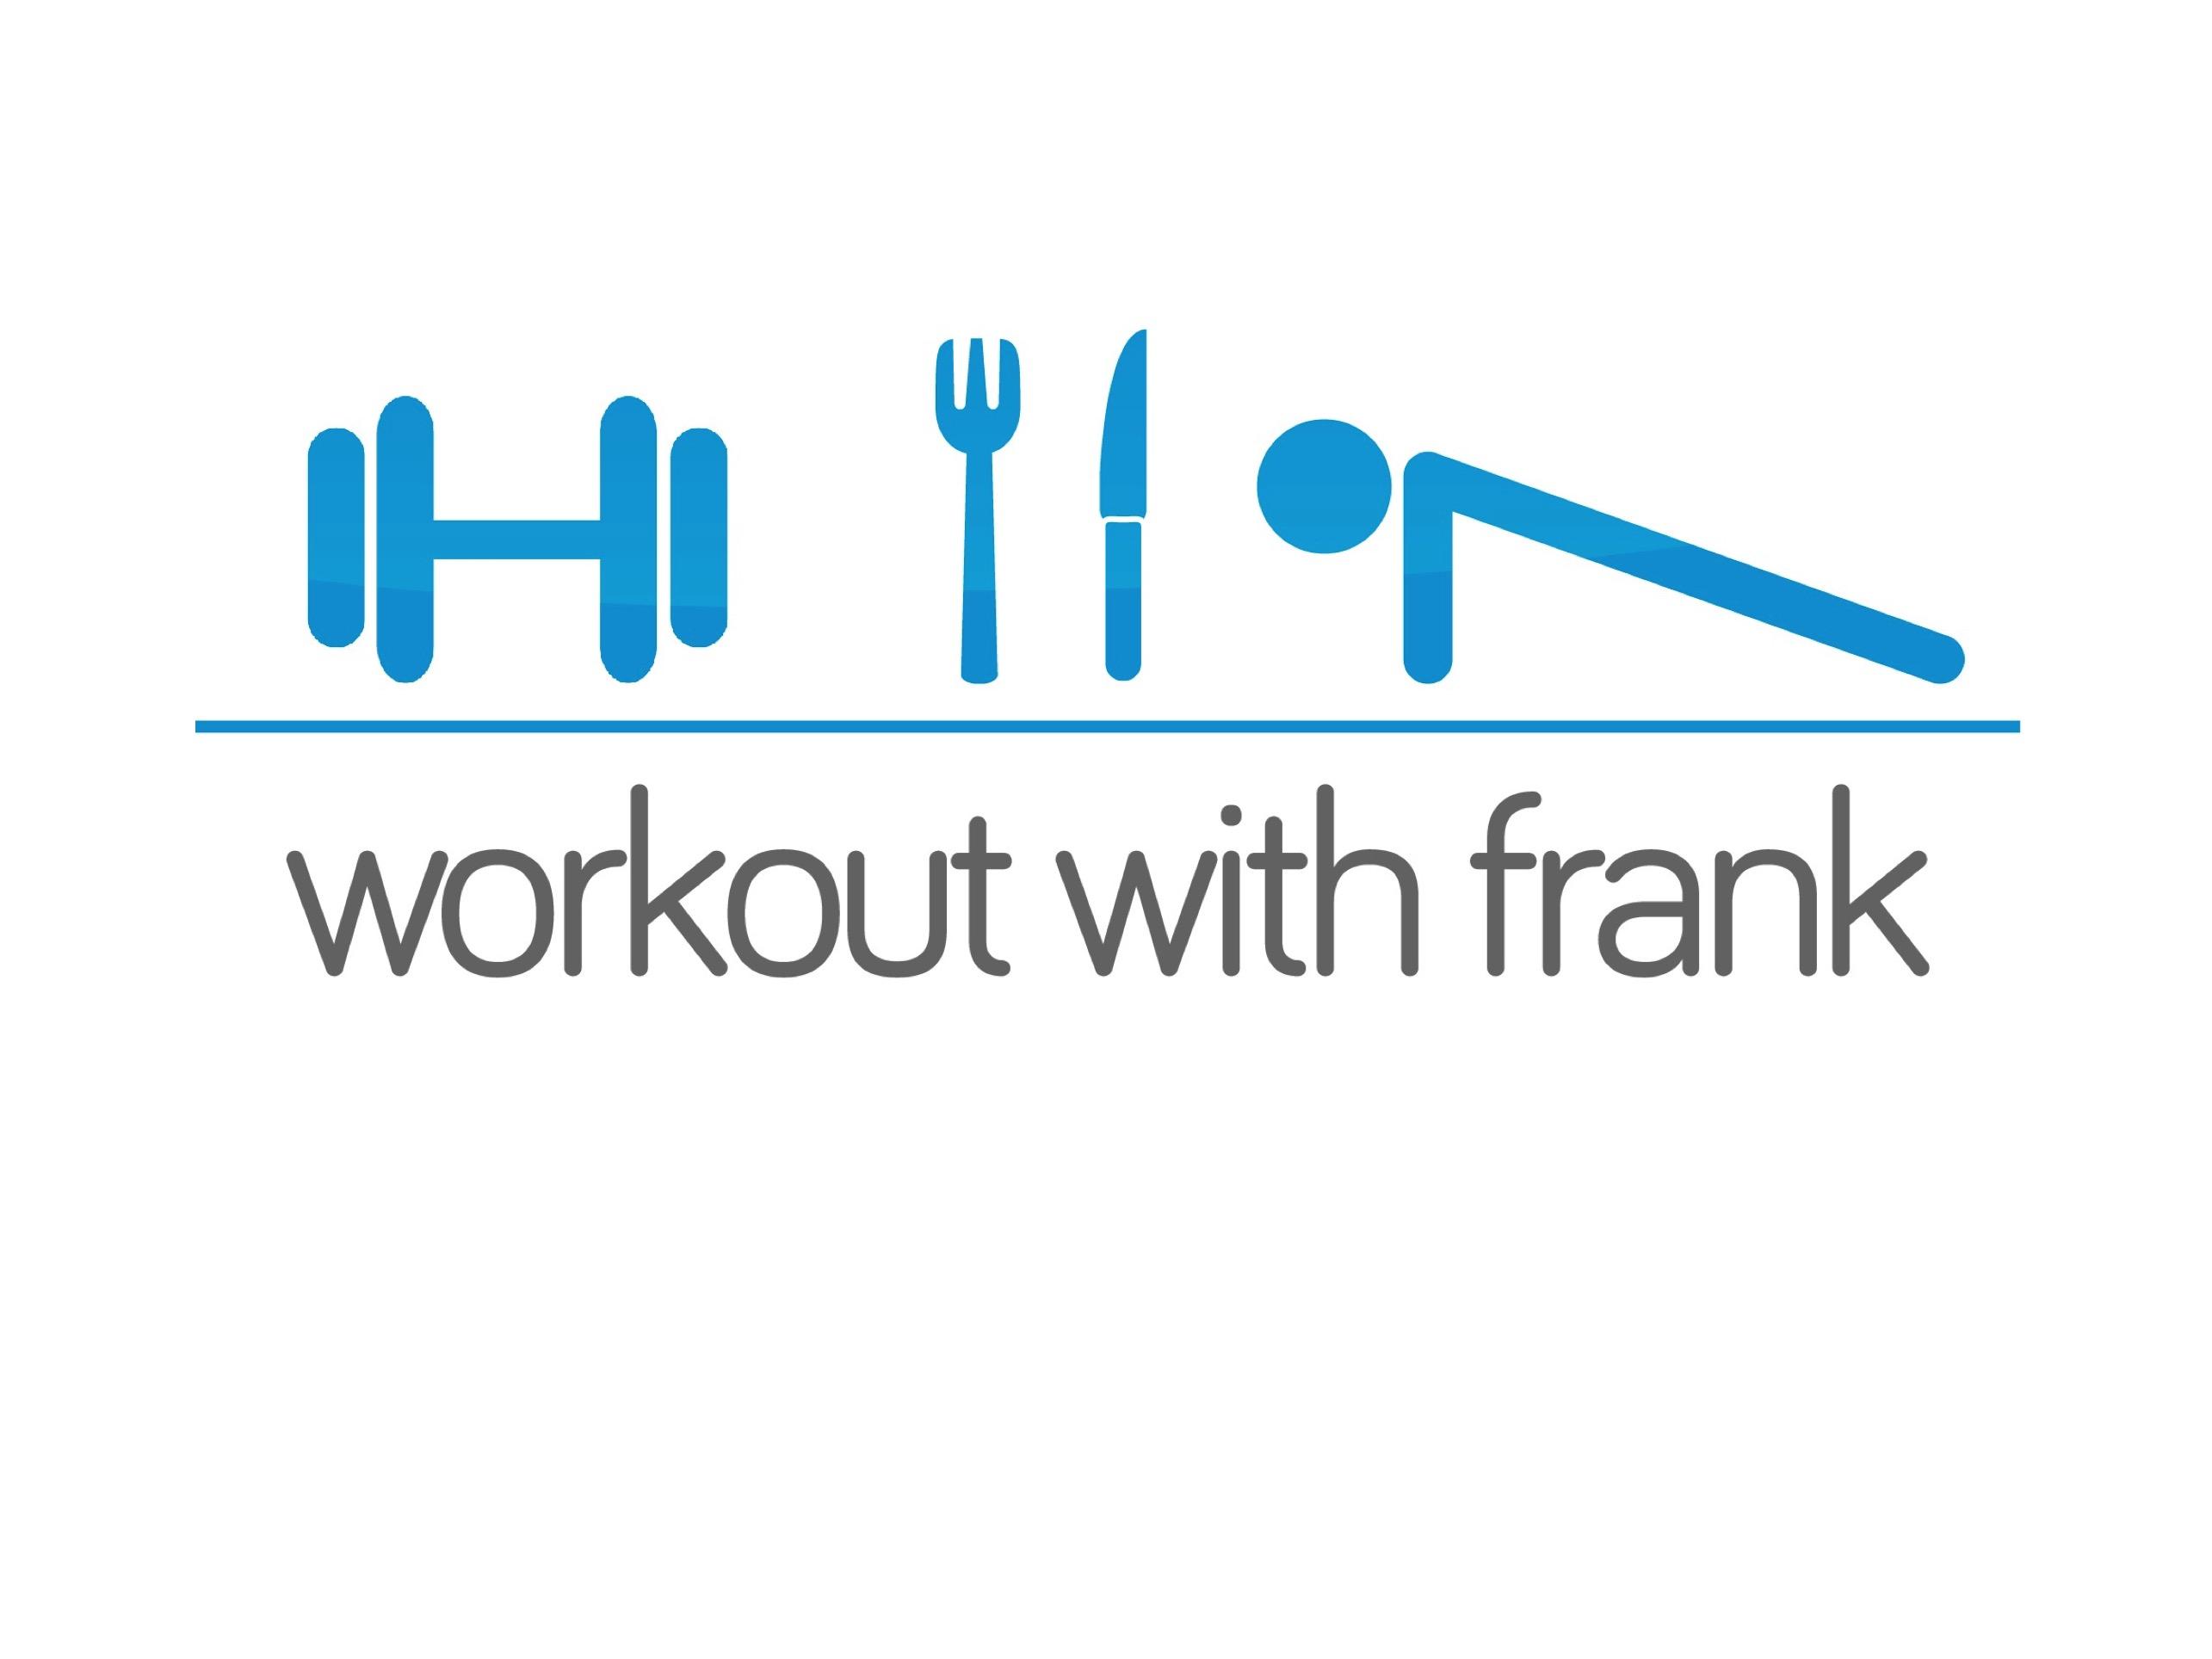 workoutwithfrank